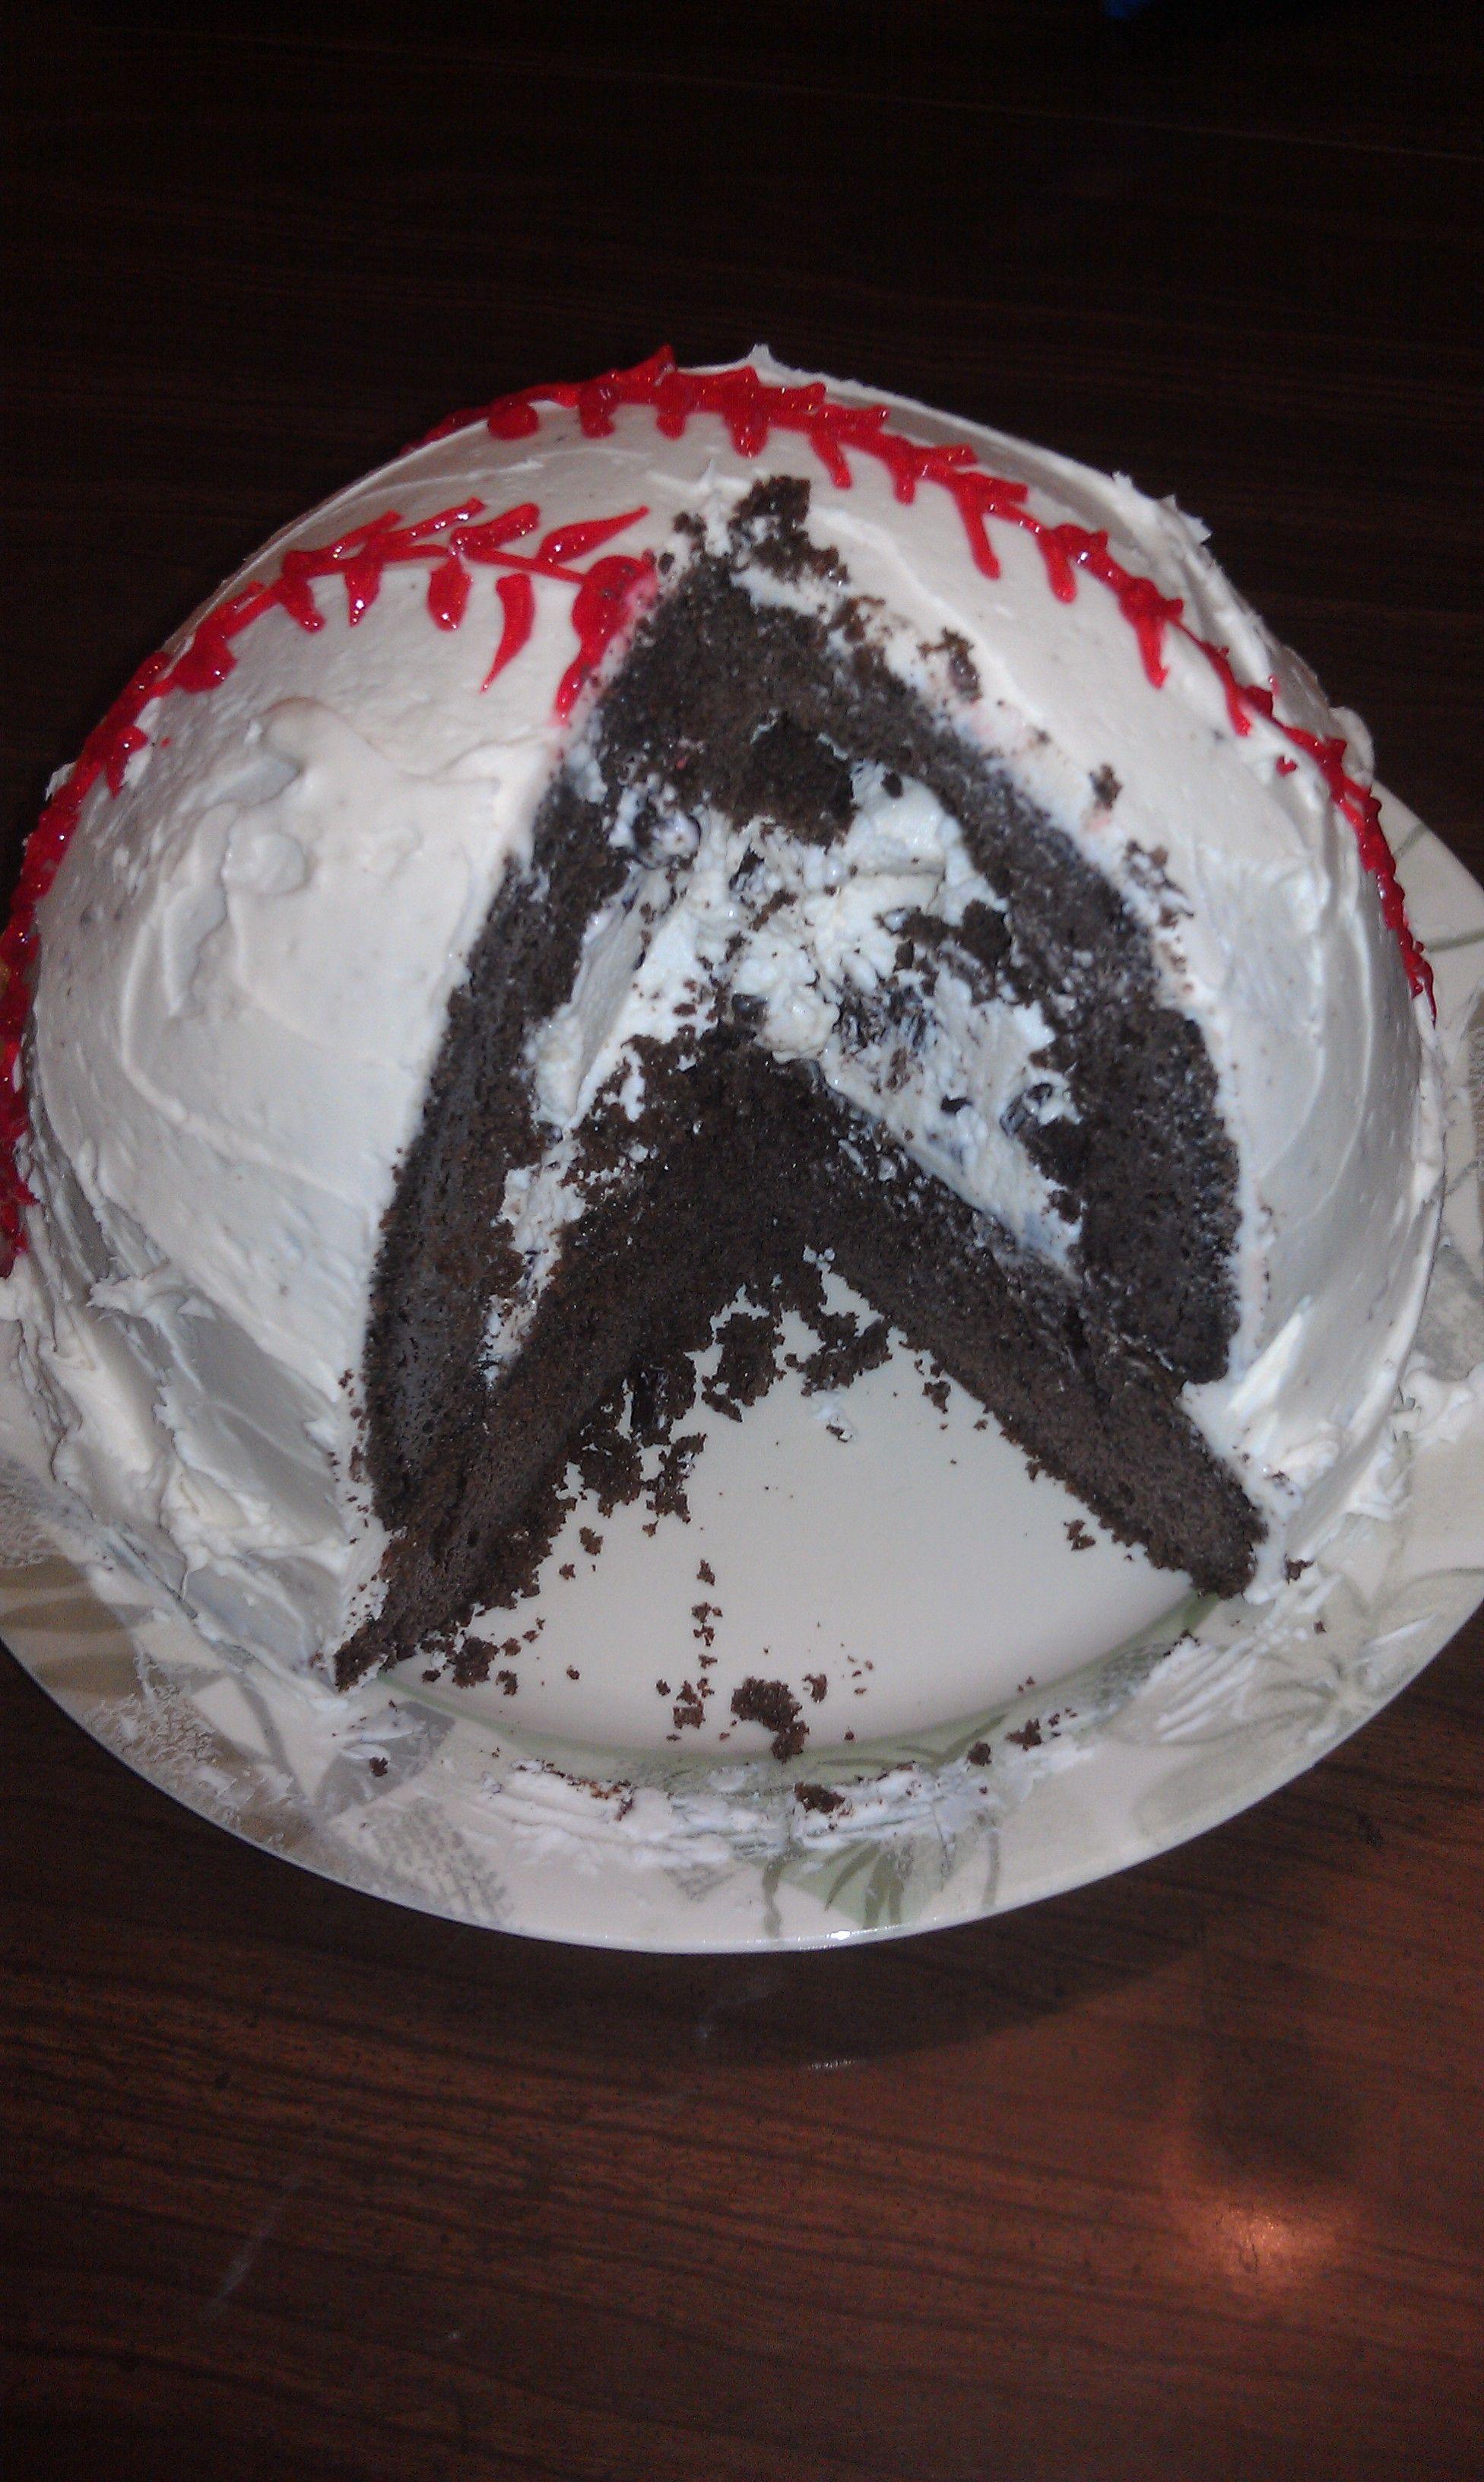 Betty Crocker Bake N Fill : betty, crocker, Recipes-How, Baseball, Maven, Cake,, Creative, Birthday, Cakes,, Betty, Crocker